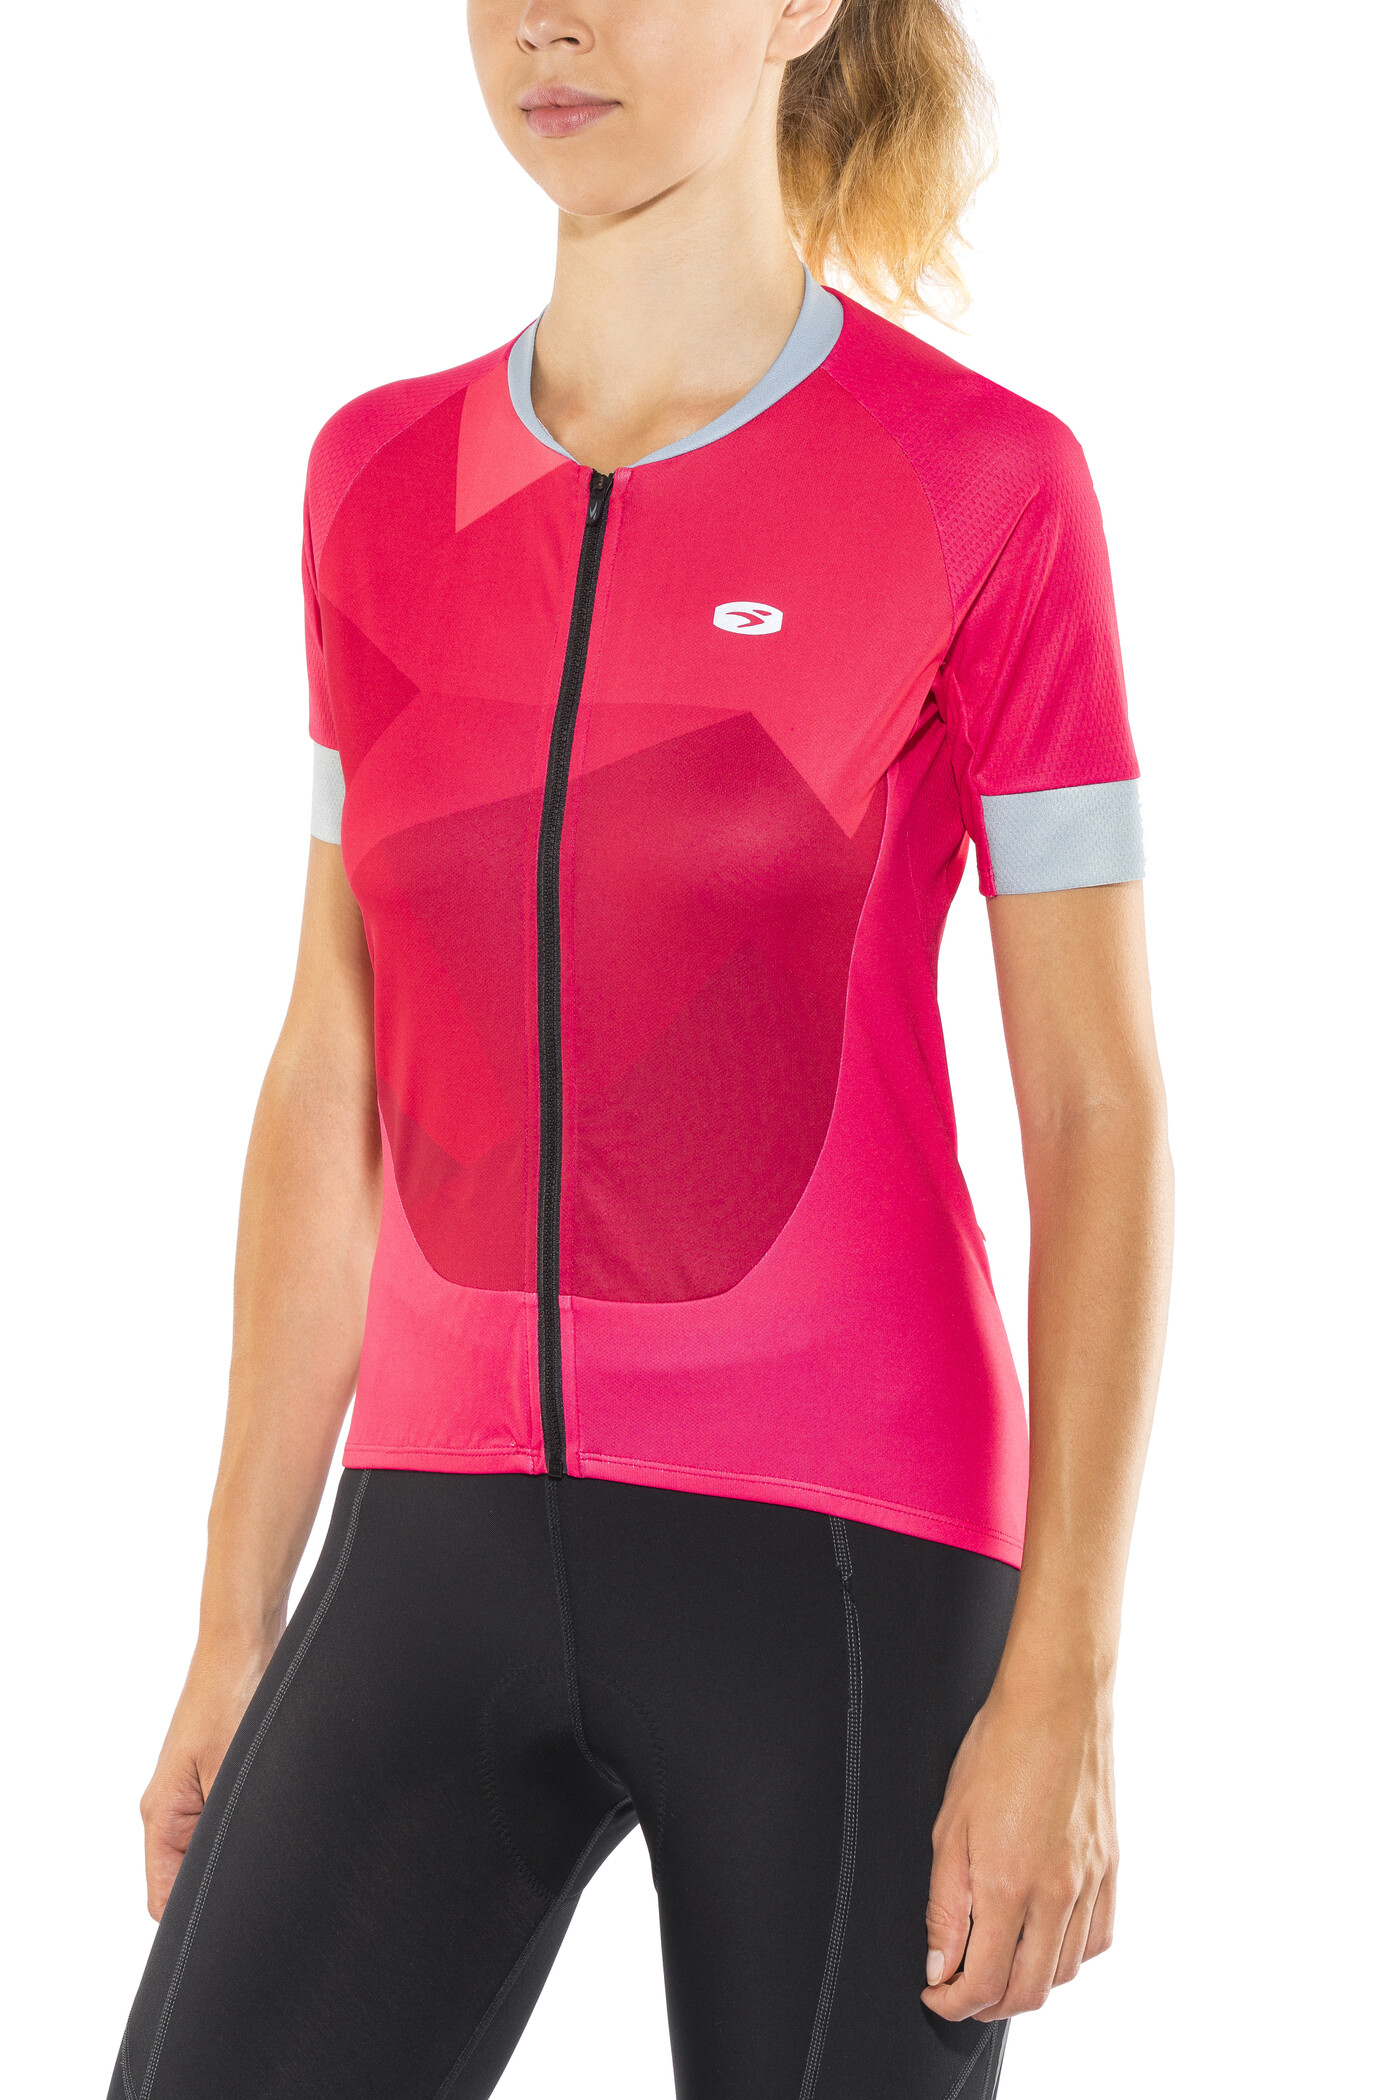 Sugoi RS Training Kortærmet cykeltrøje Damer, pink   Jerseys